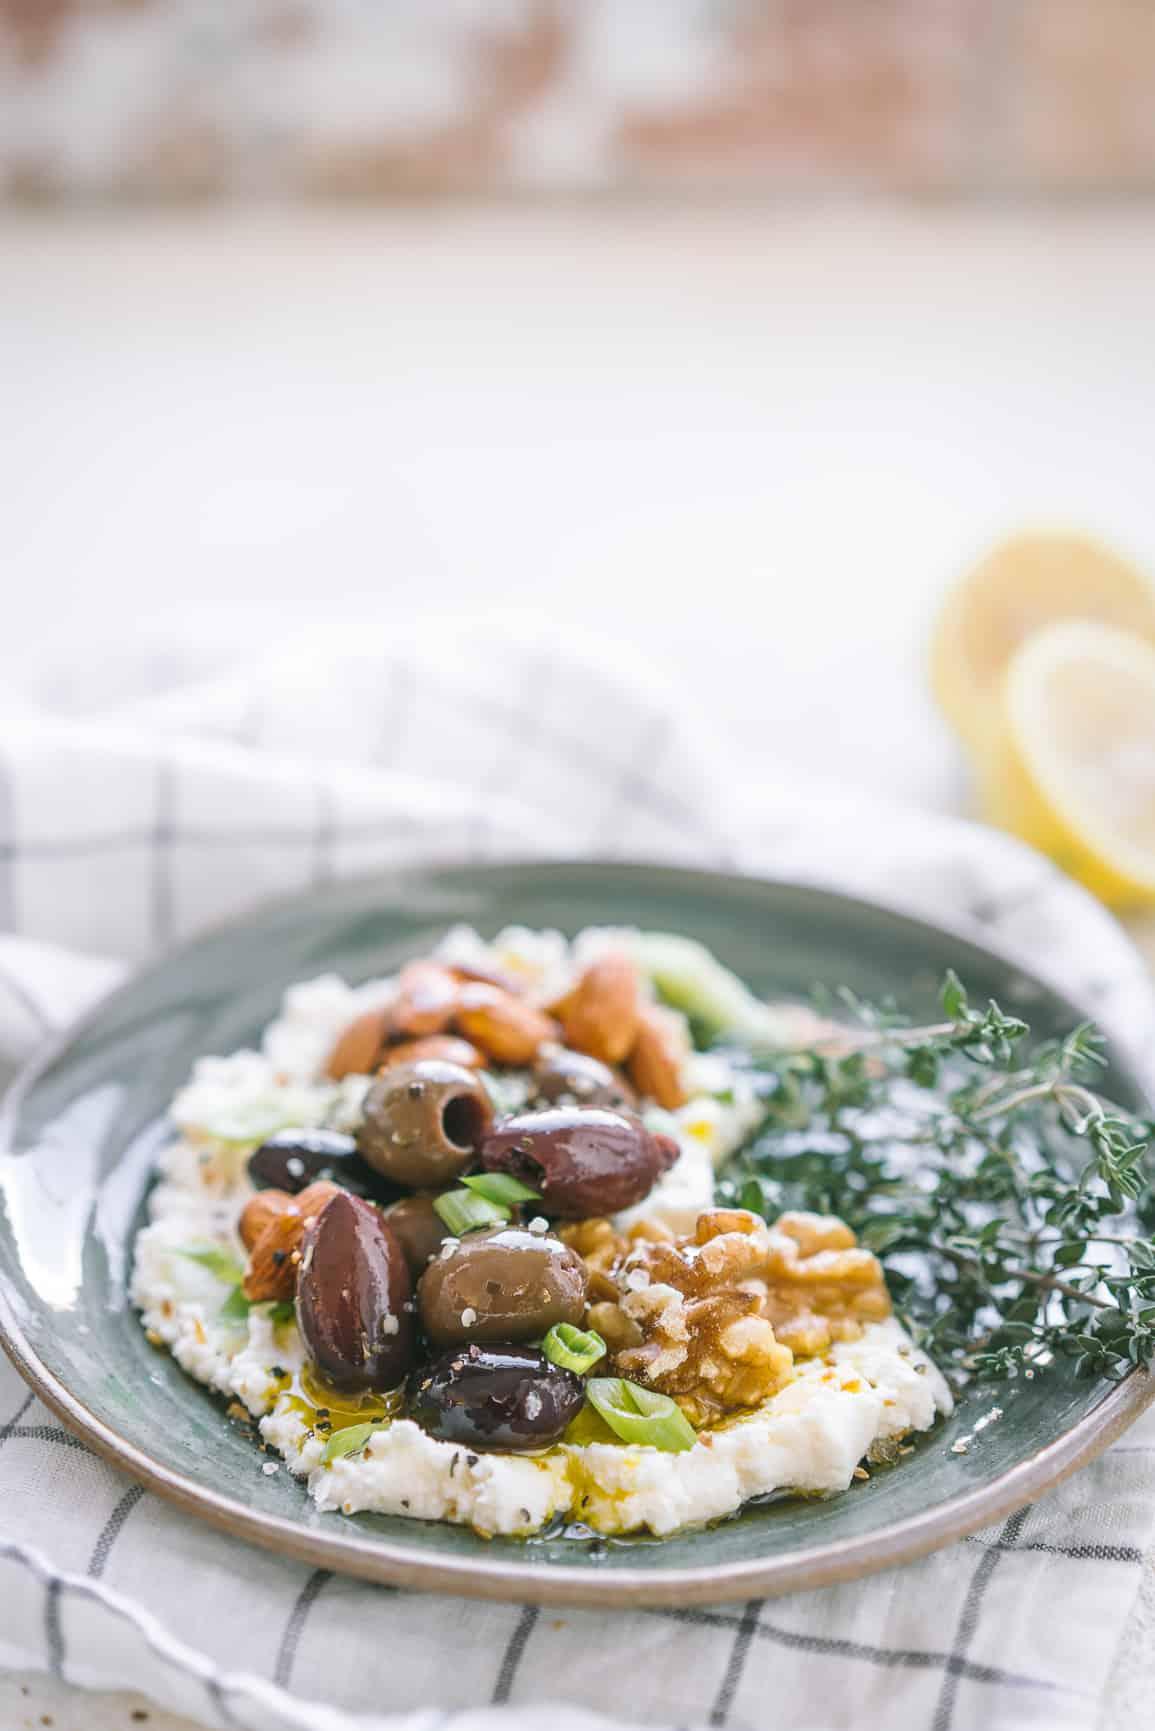 Savory Ricotta Olive Nut Bowl {Low-Carb & Keto}